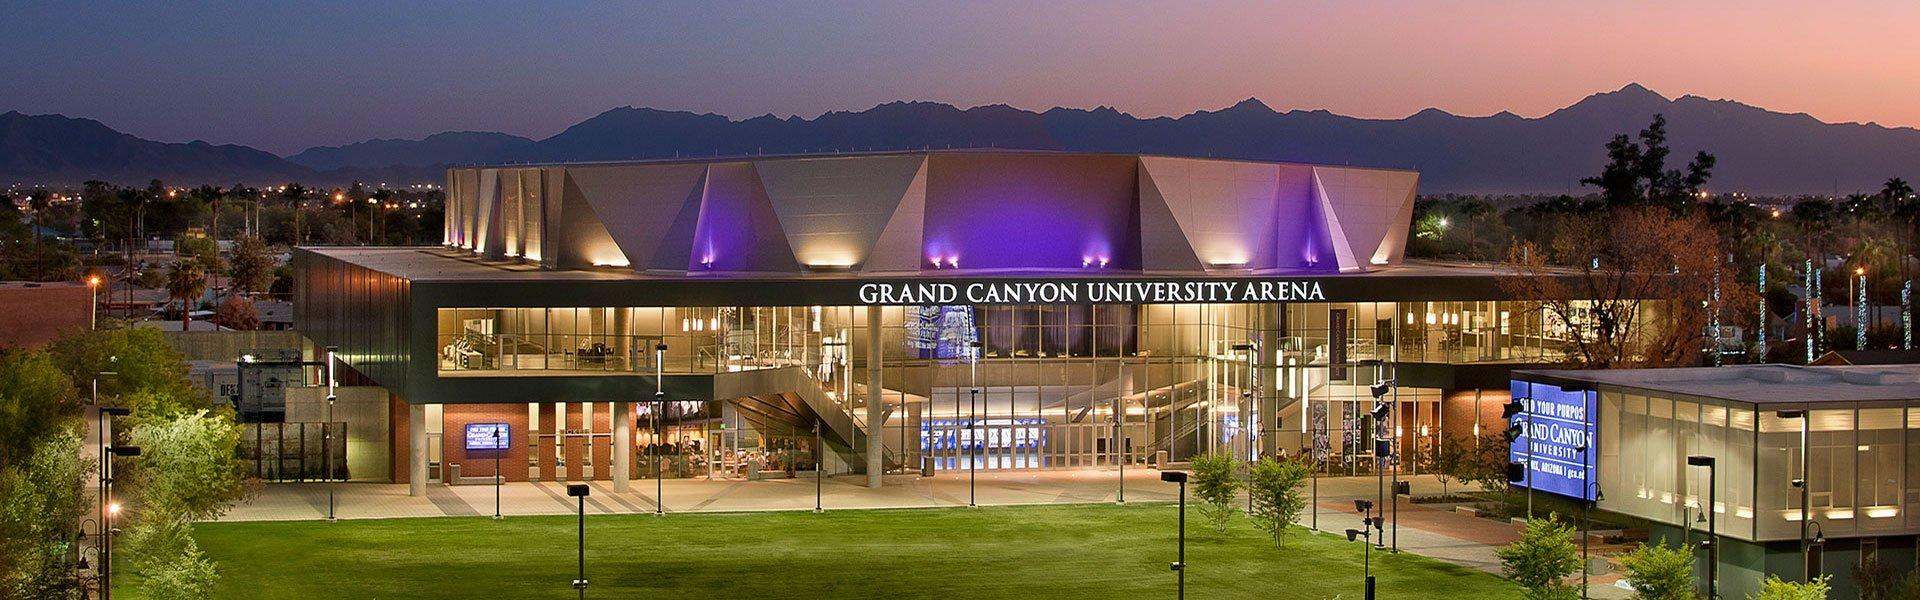 Aerial view of GCU Arena on the GCU Campus in Phoenix, AZ.